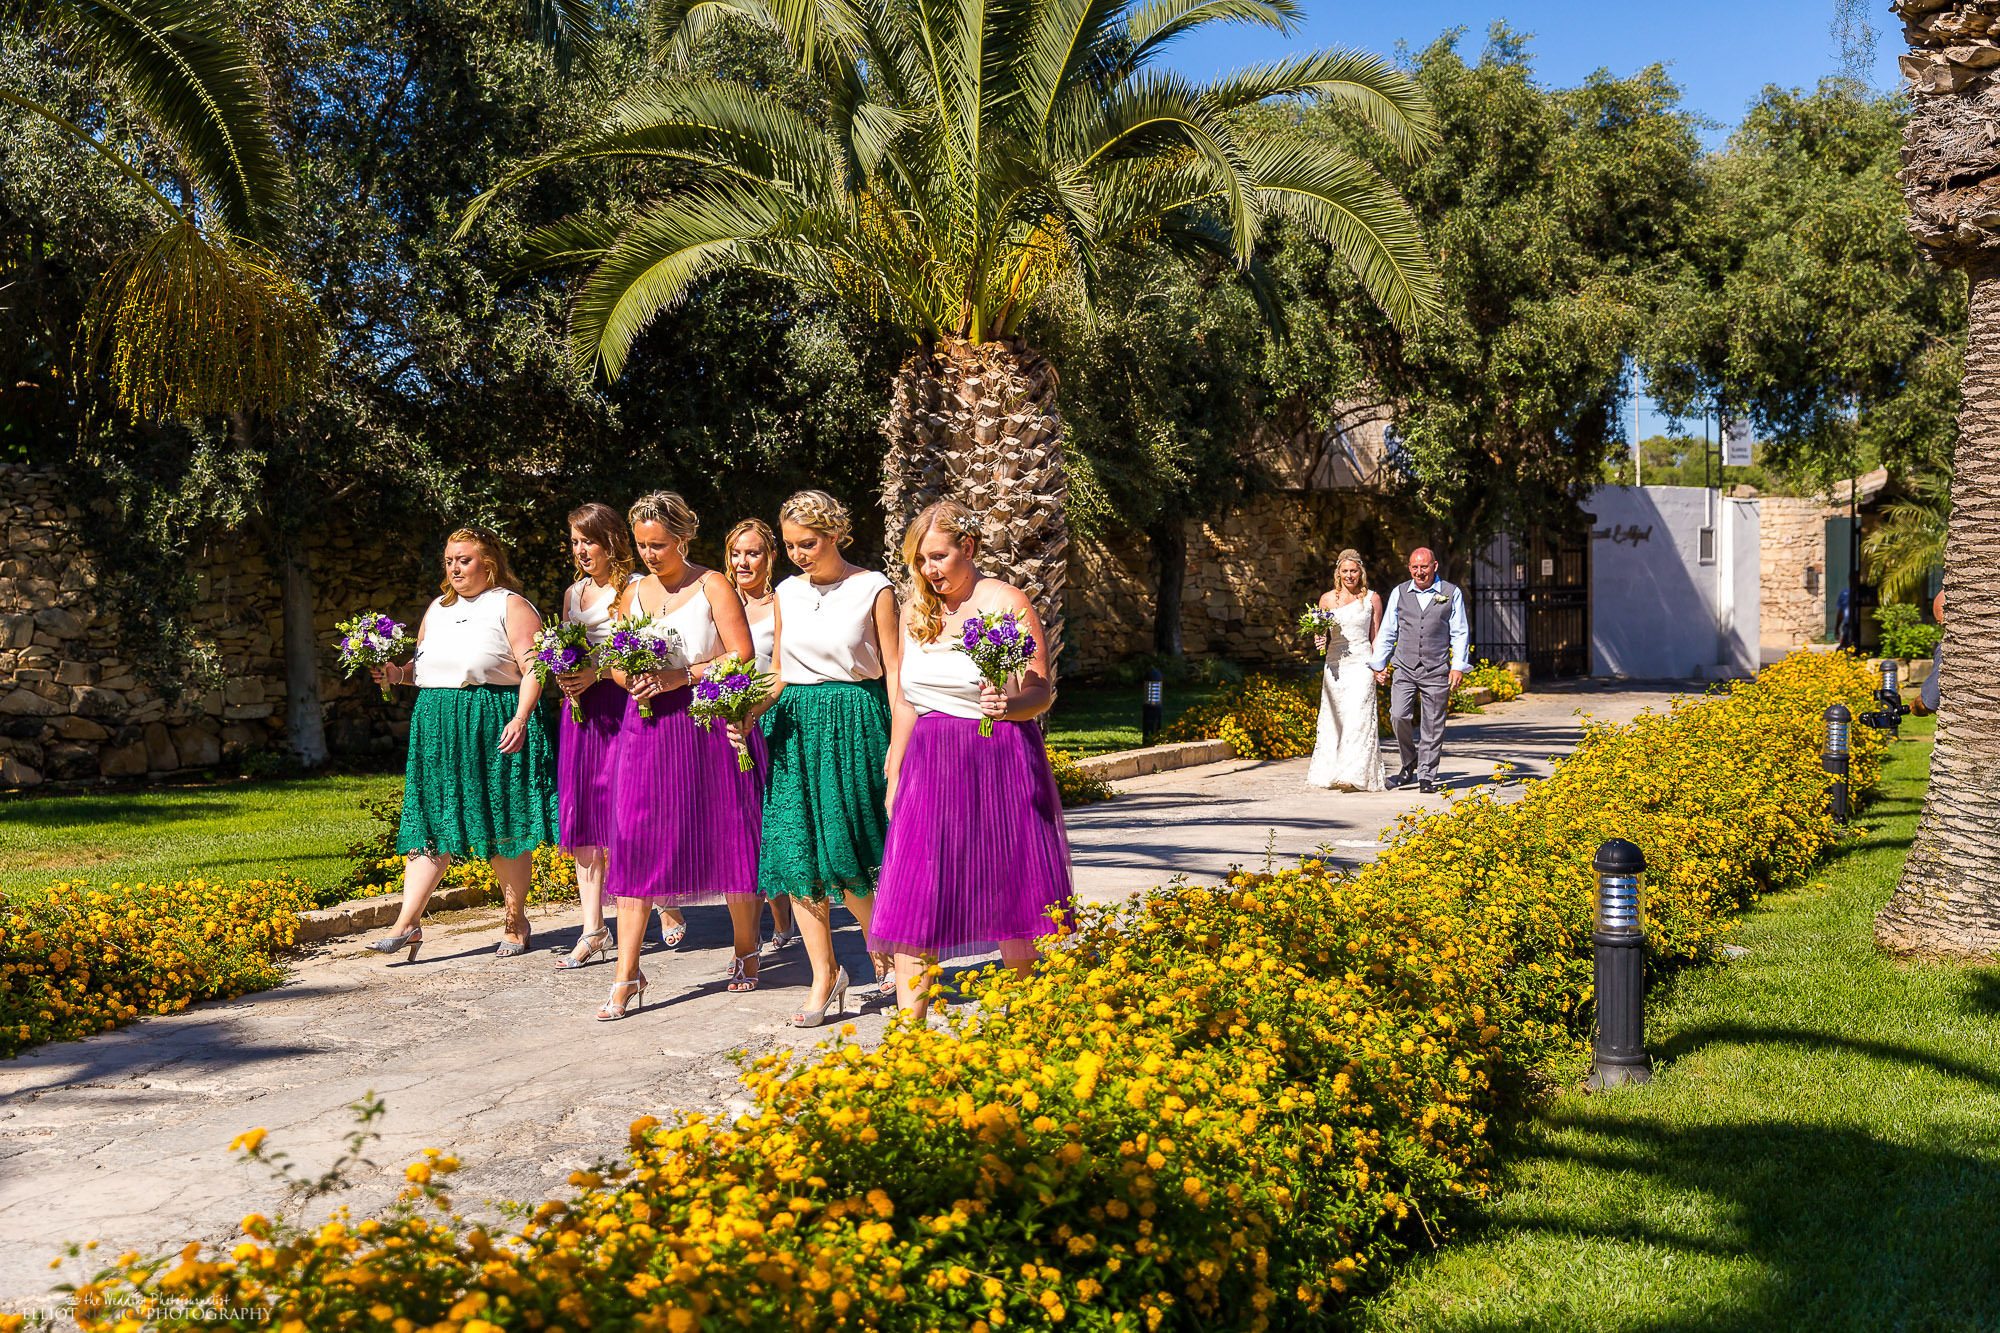 bride-father-wedding-bridesmaids-procession-ceremony-weddings-photographer